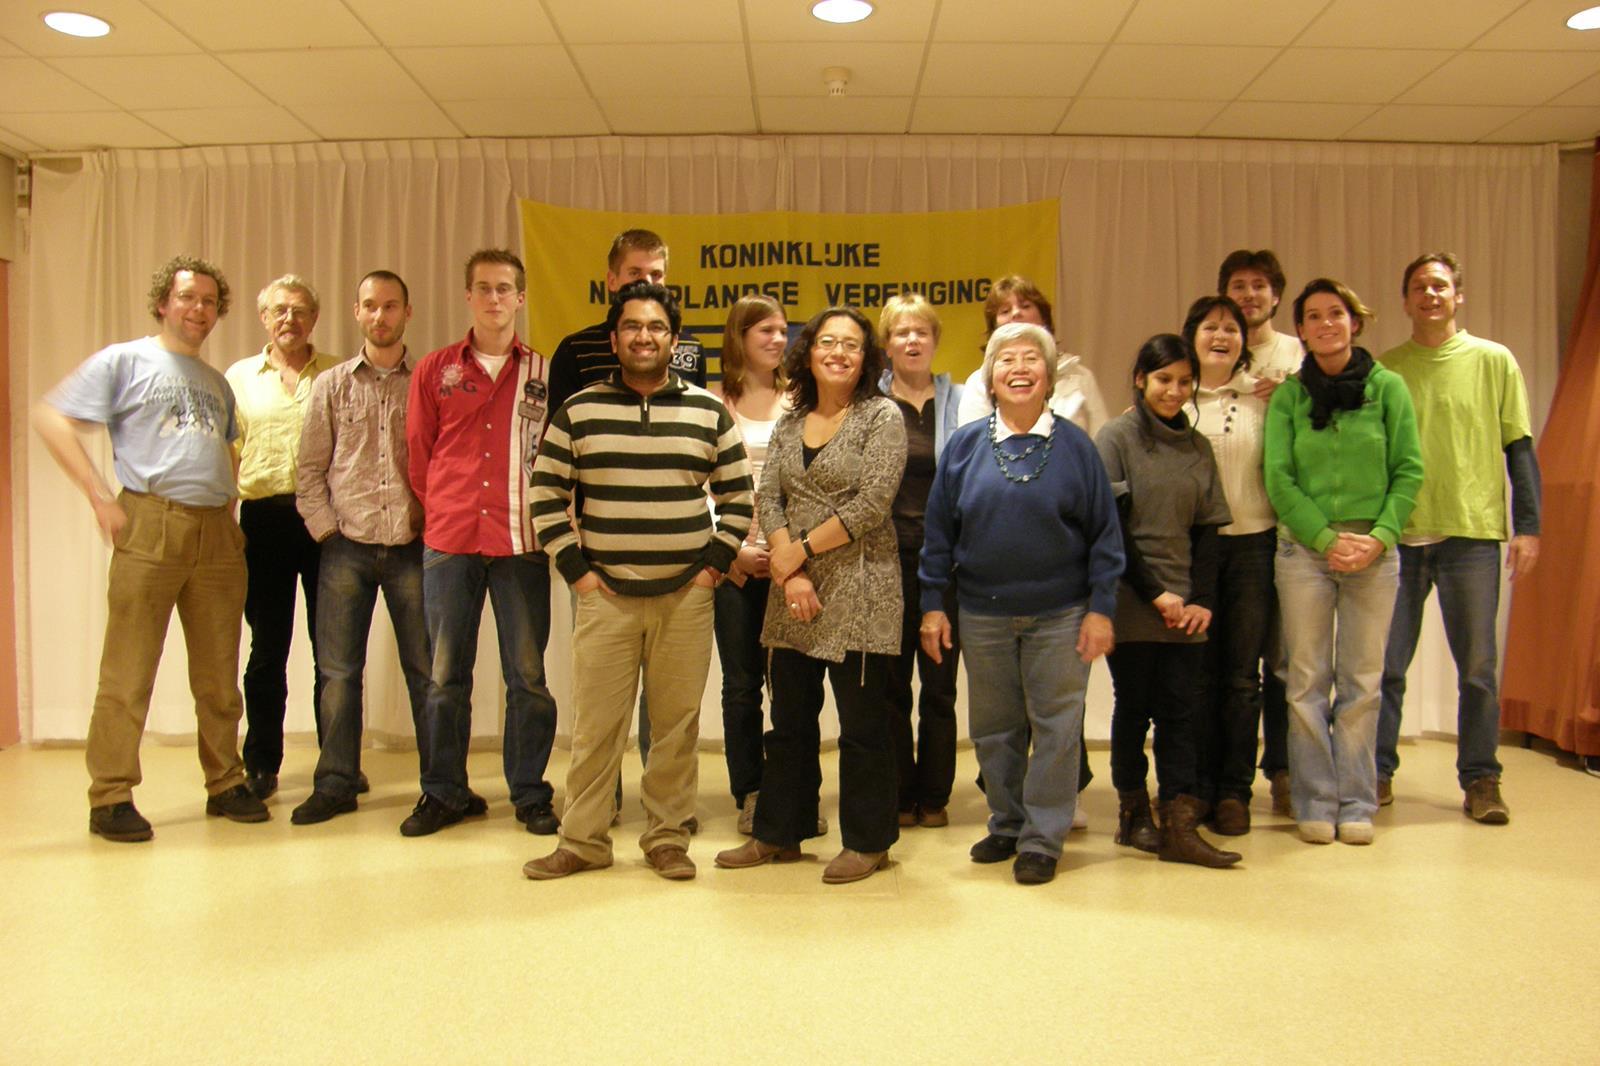 groepsfoto-2010-002